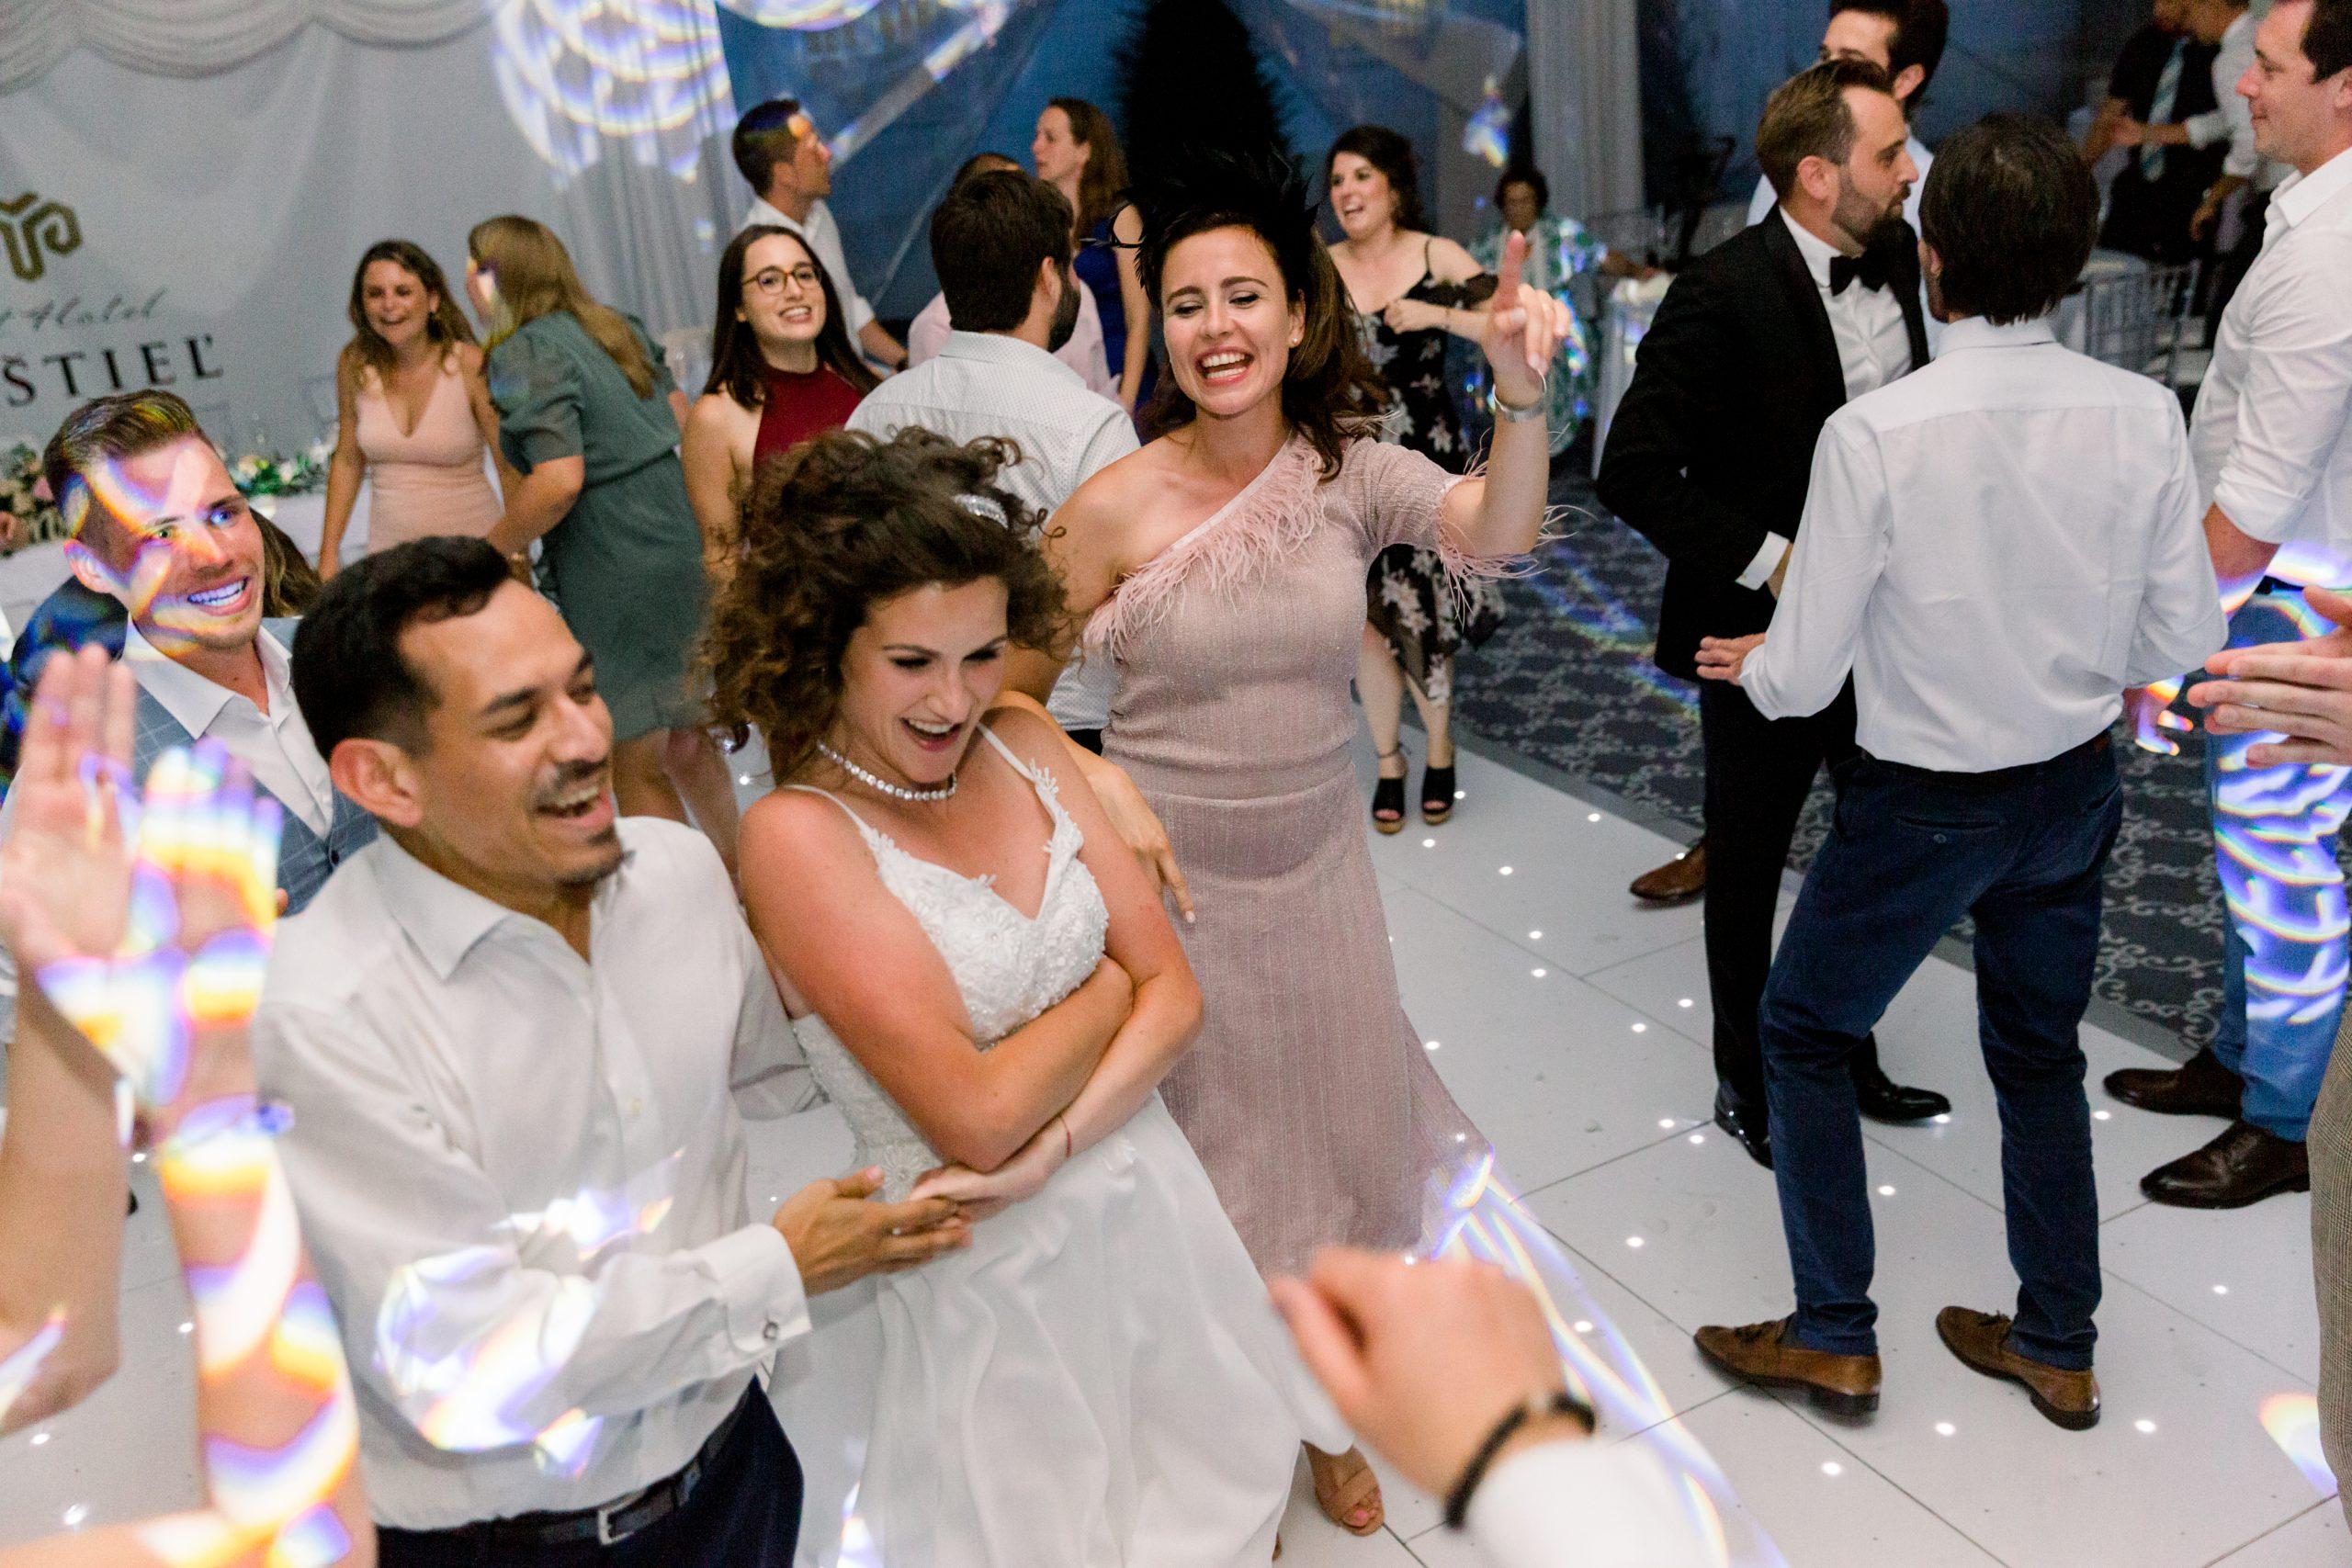 Svadba Art Hotel Kaštiel, Tomášov 02 #svadobnyDJ, #djanasvadbu, #svadba, #svadbatomasov, #DJAnavi